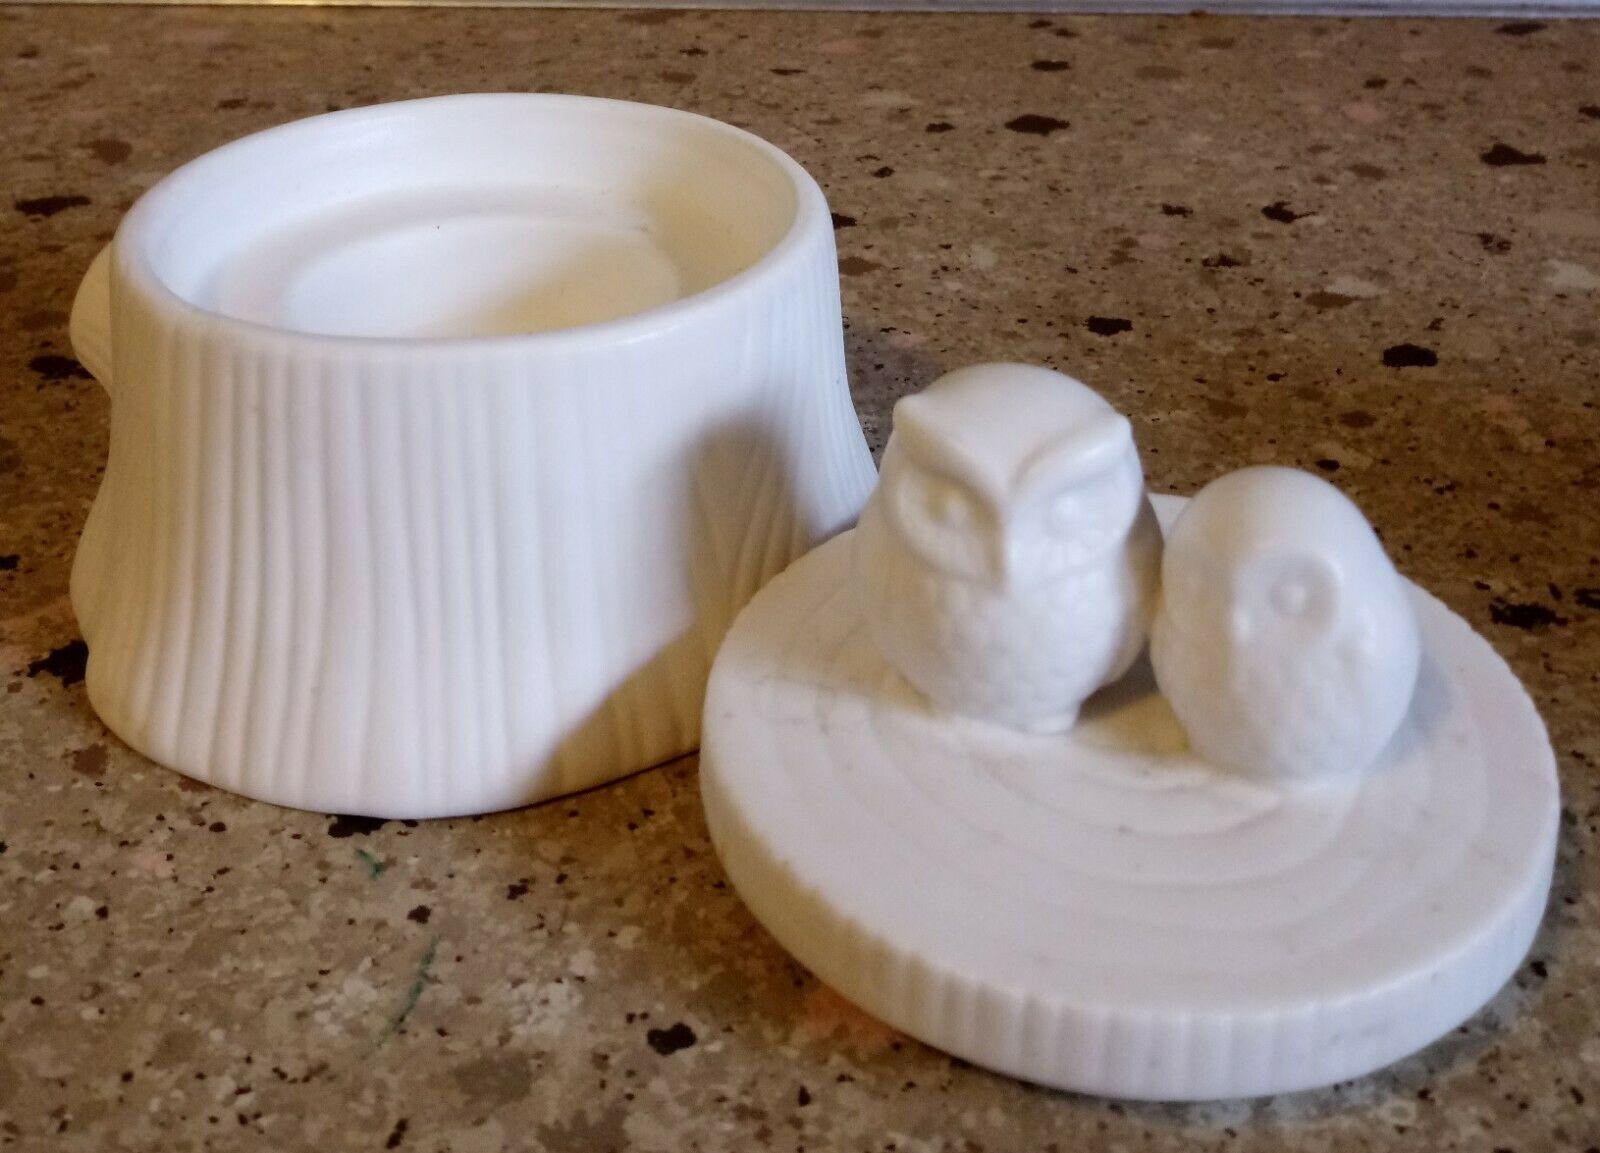 PartyLite Owls Essential Jar Holder White Tea Light Holder